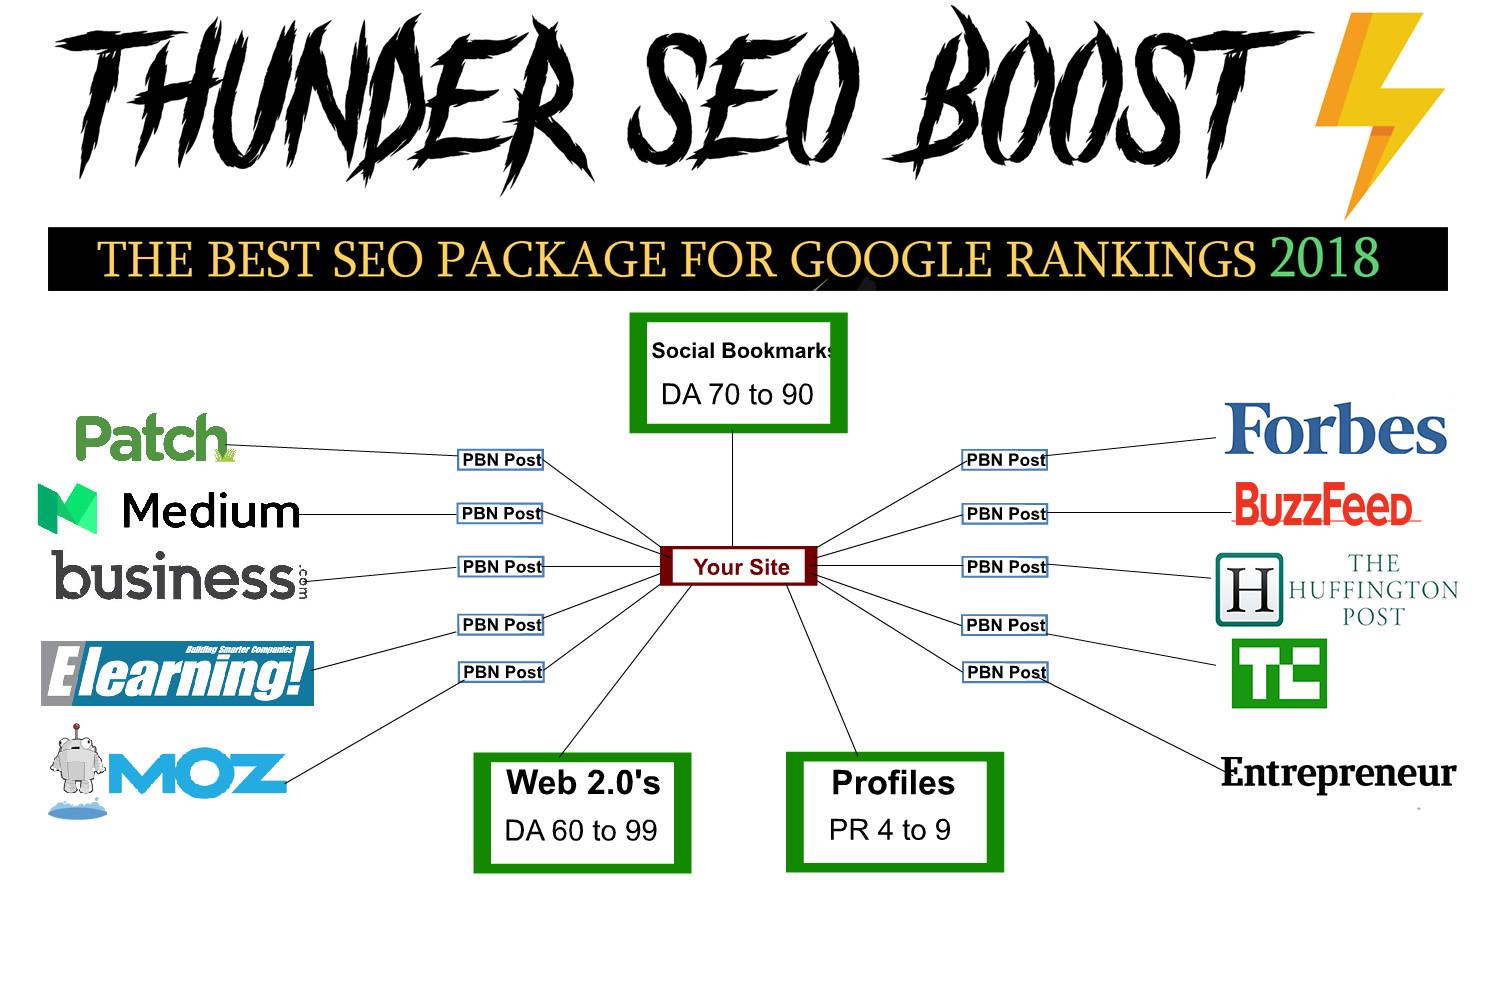 2018 Thunder Ranker,  PBN's,  Web 2.0,  Social Signals,  Social Bookmarks SEO